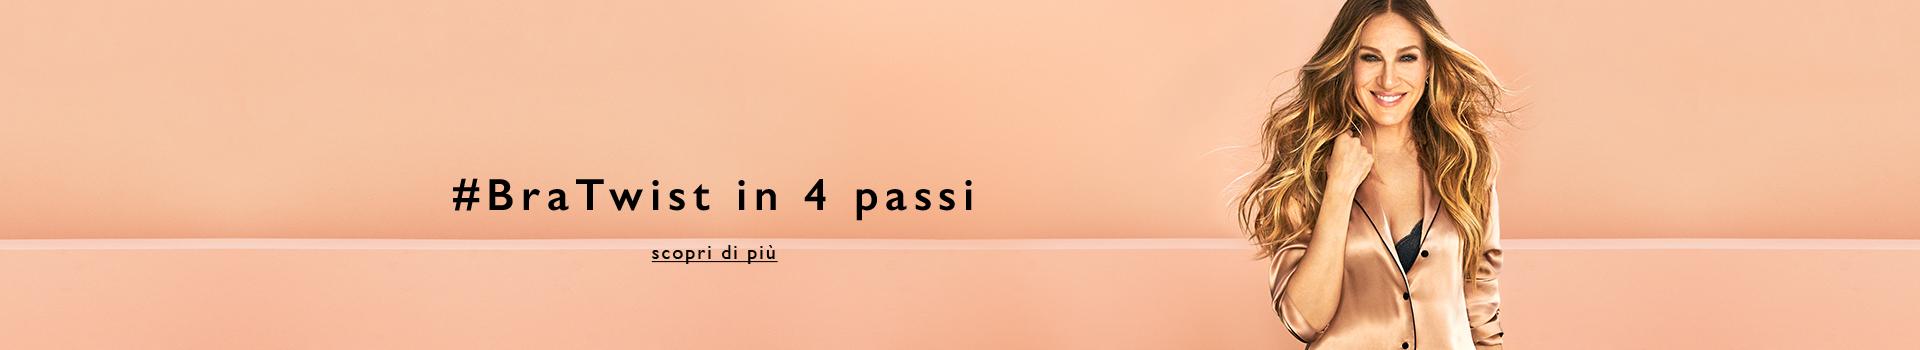 My Intimissimi Banner